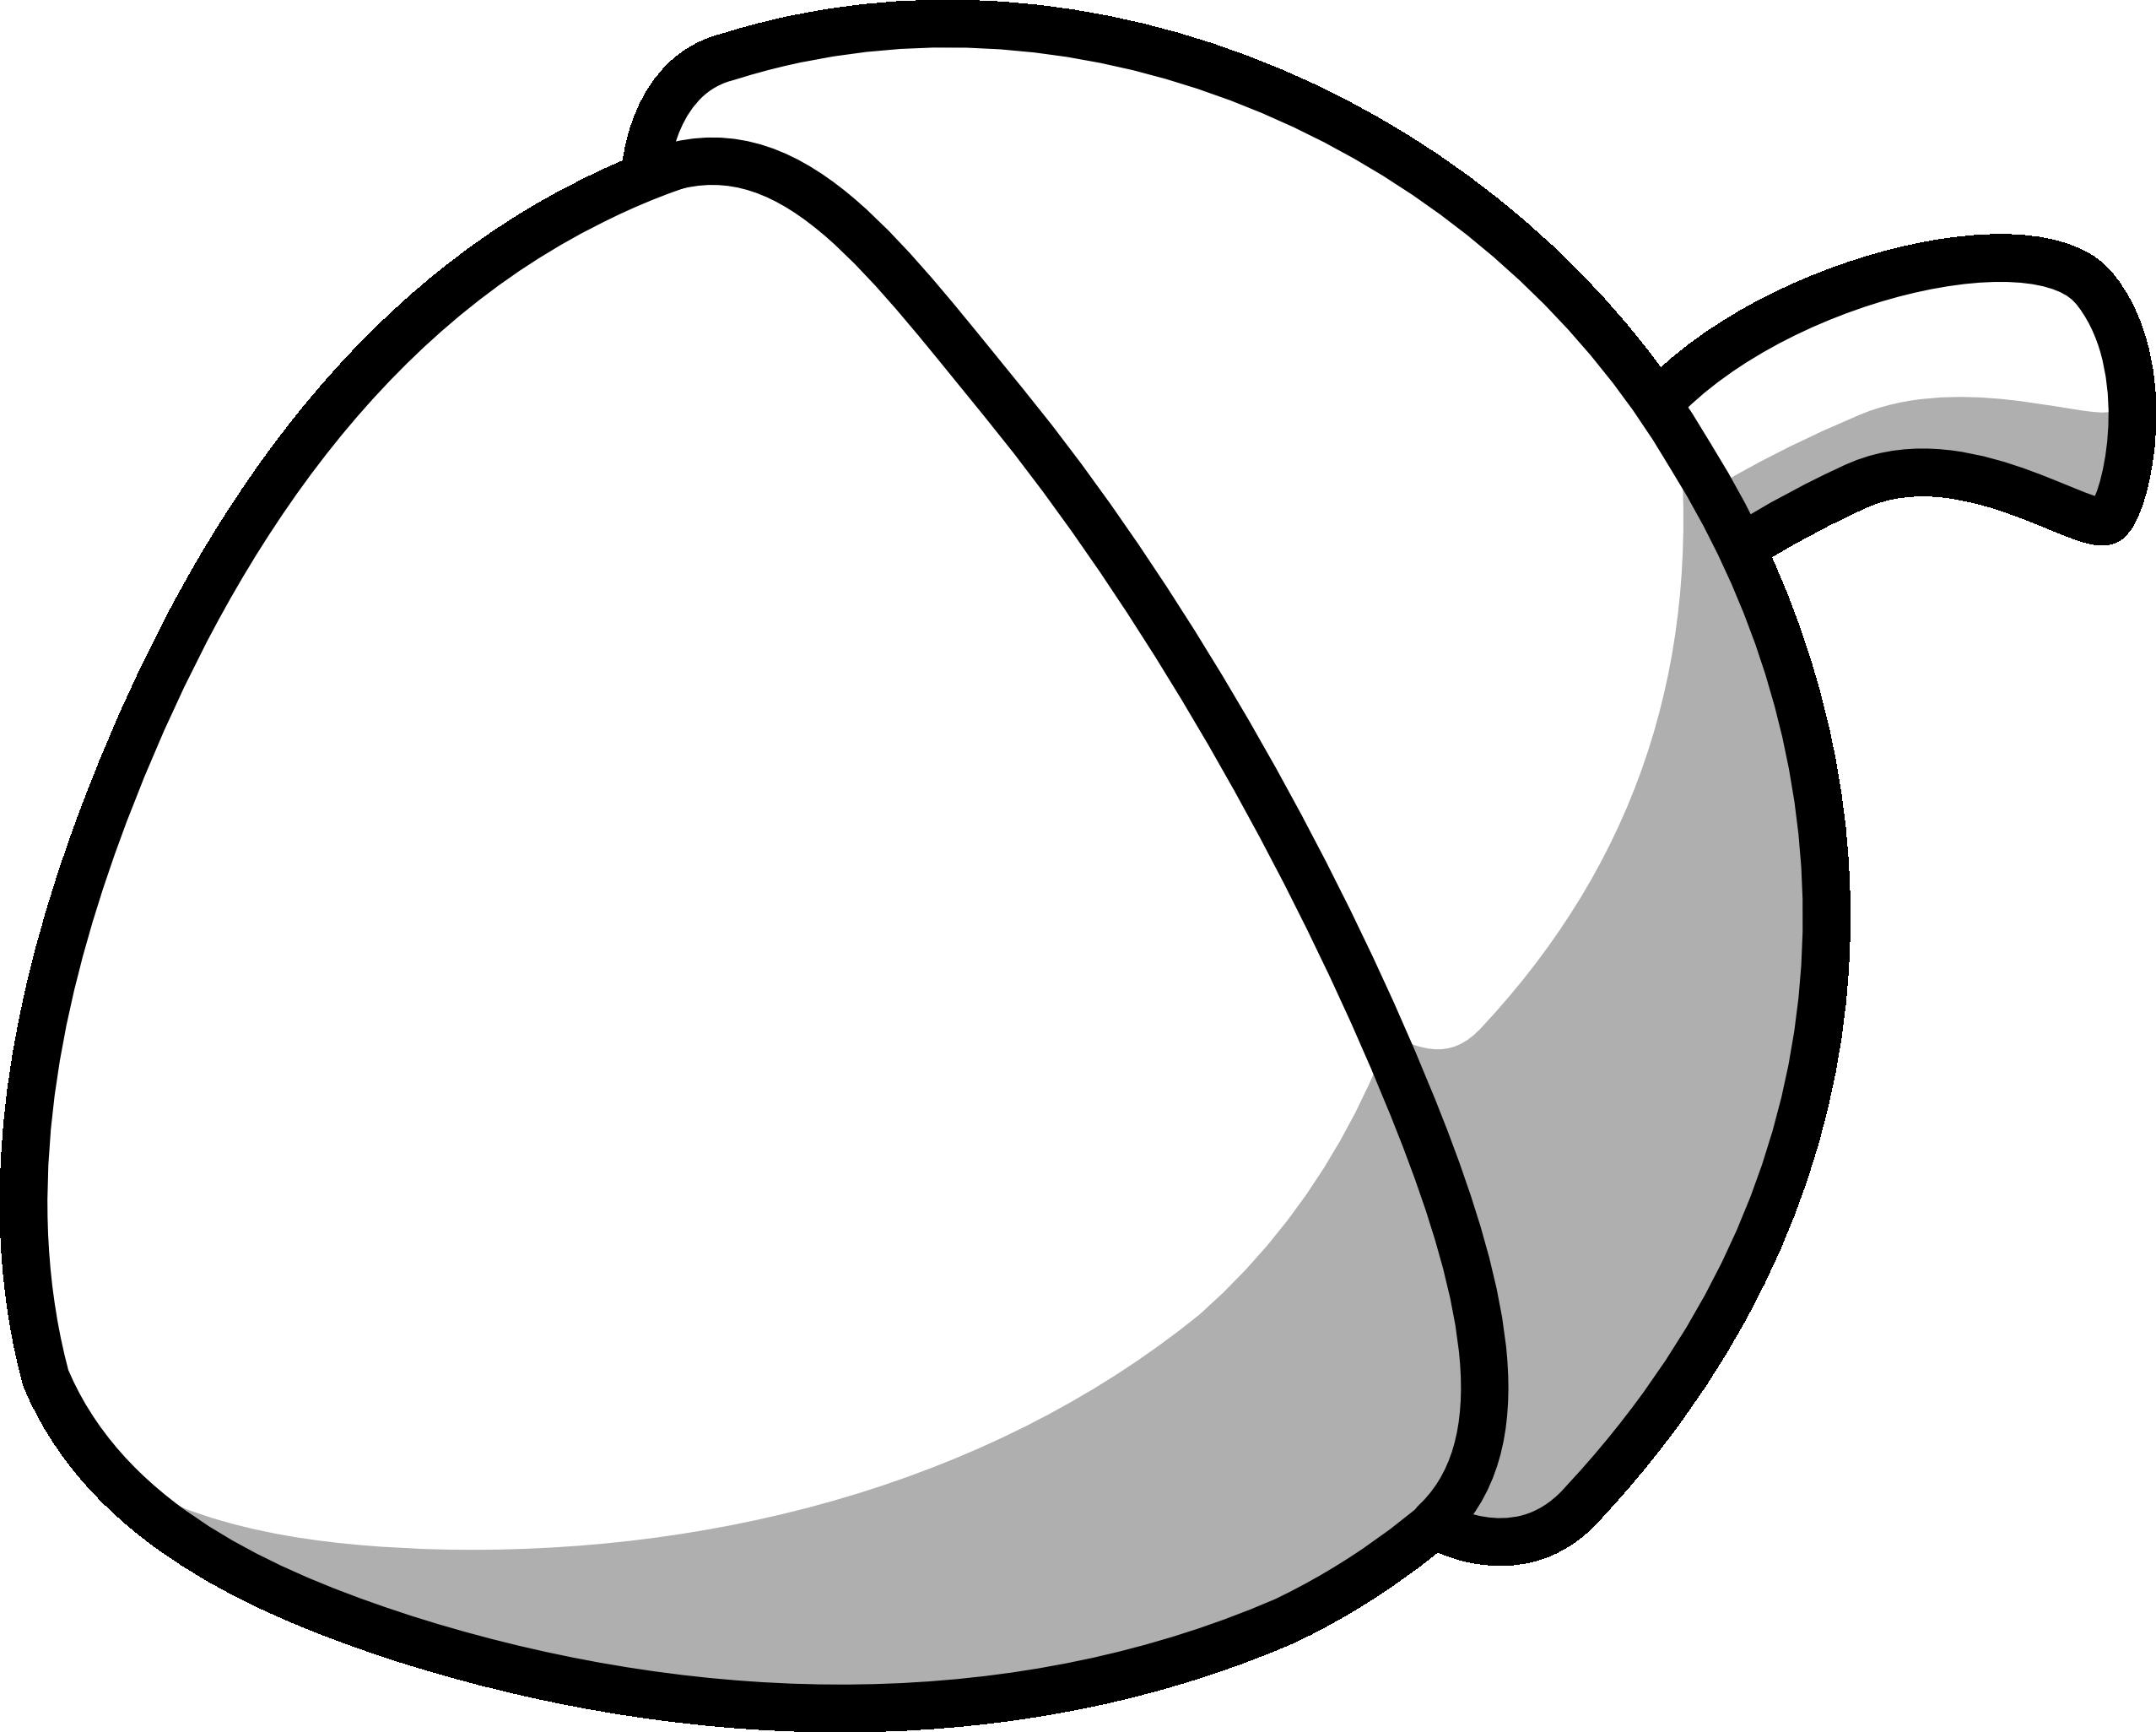 large Acorn clip art black and white.